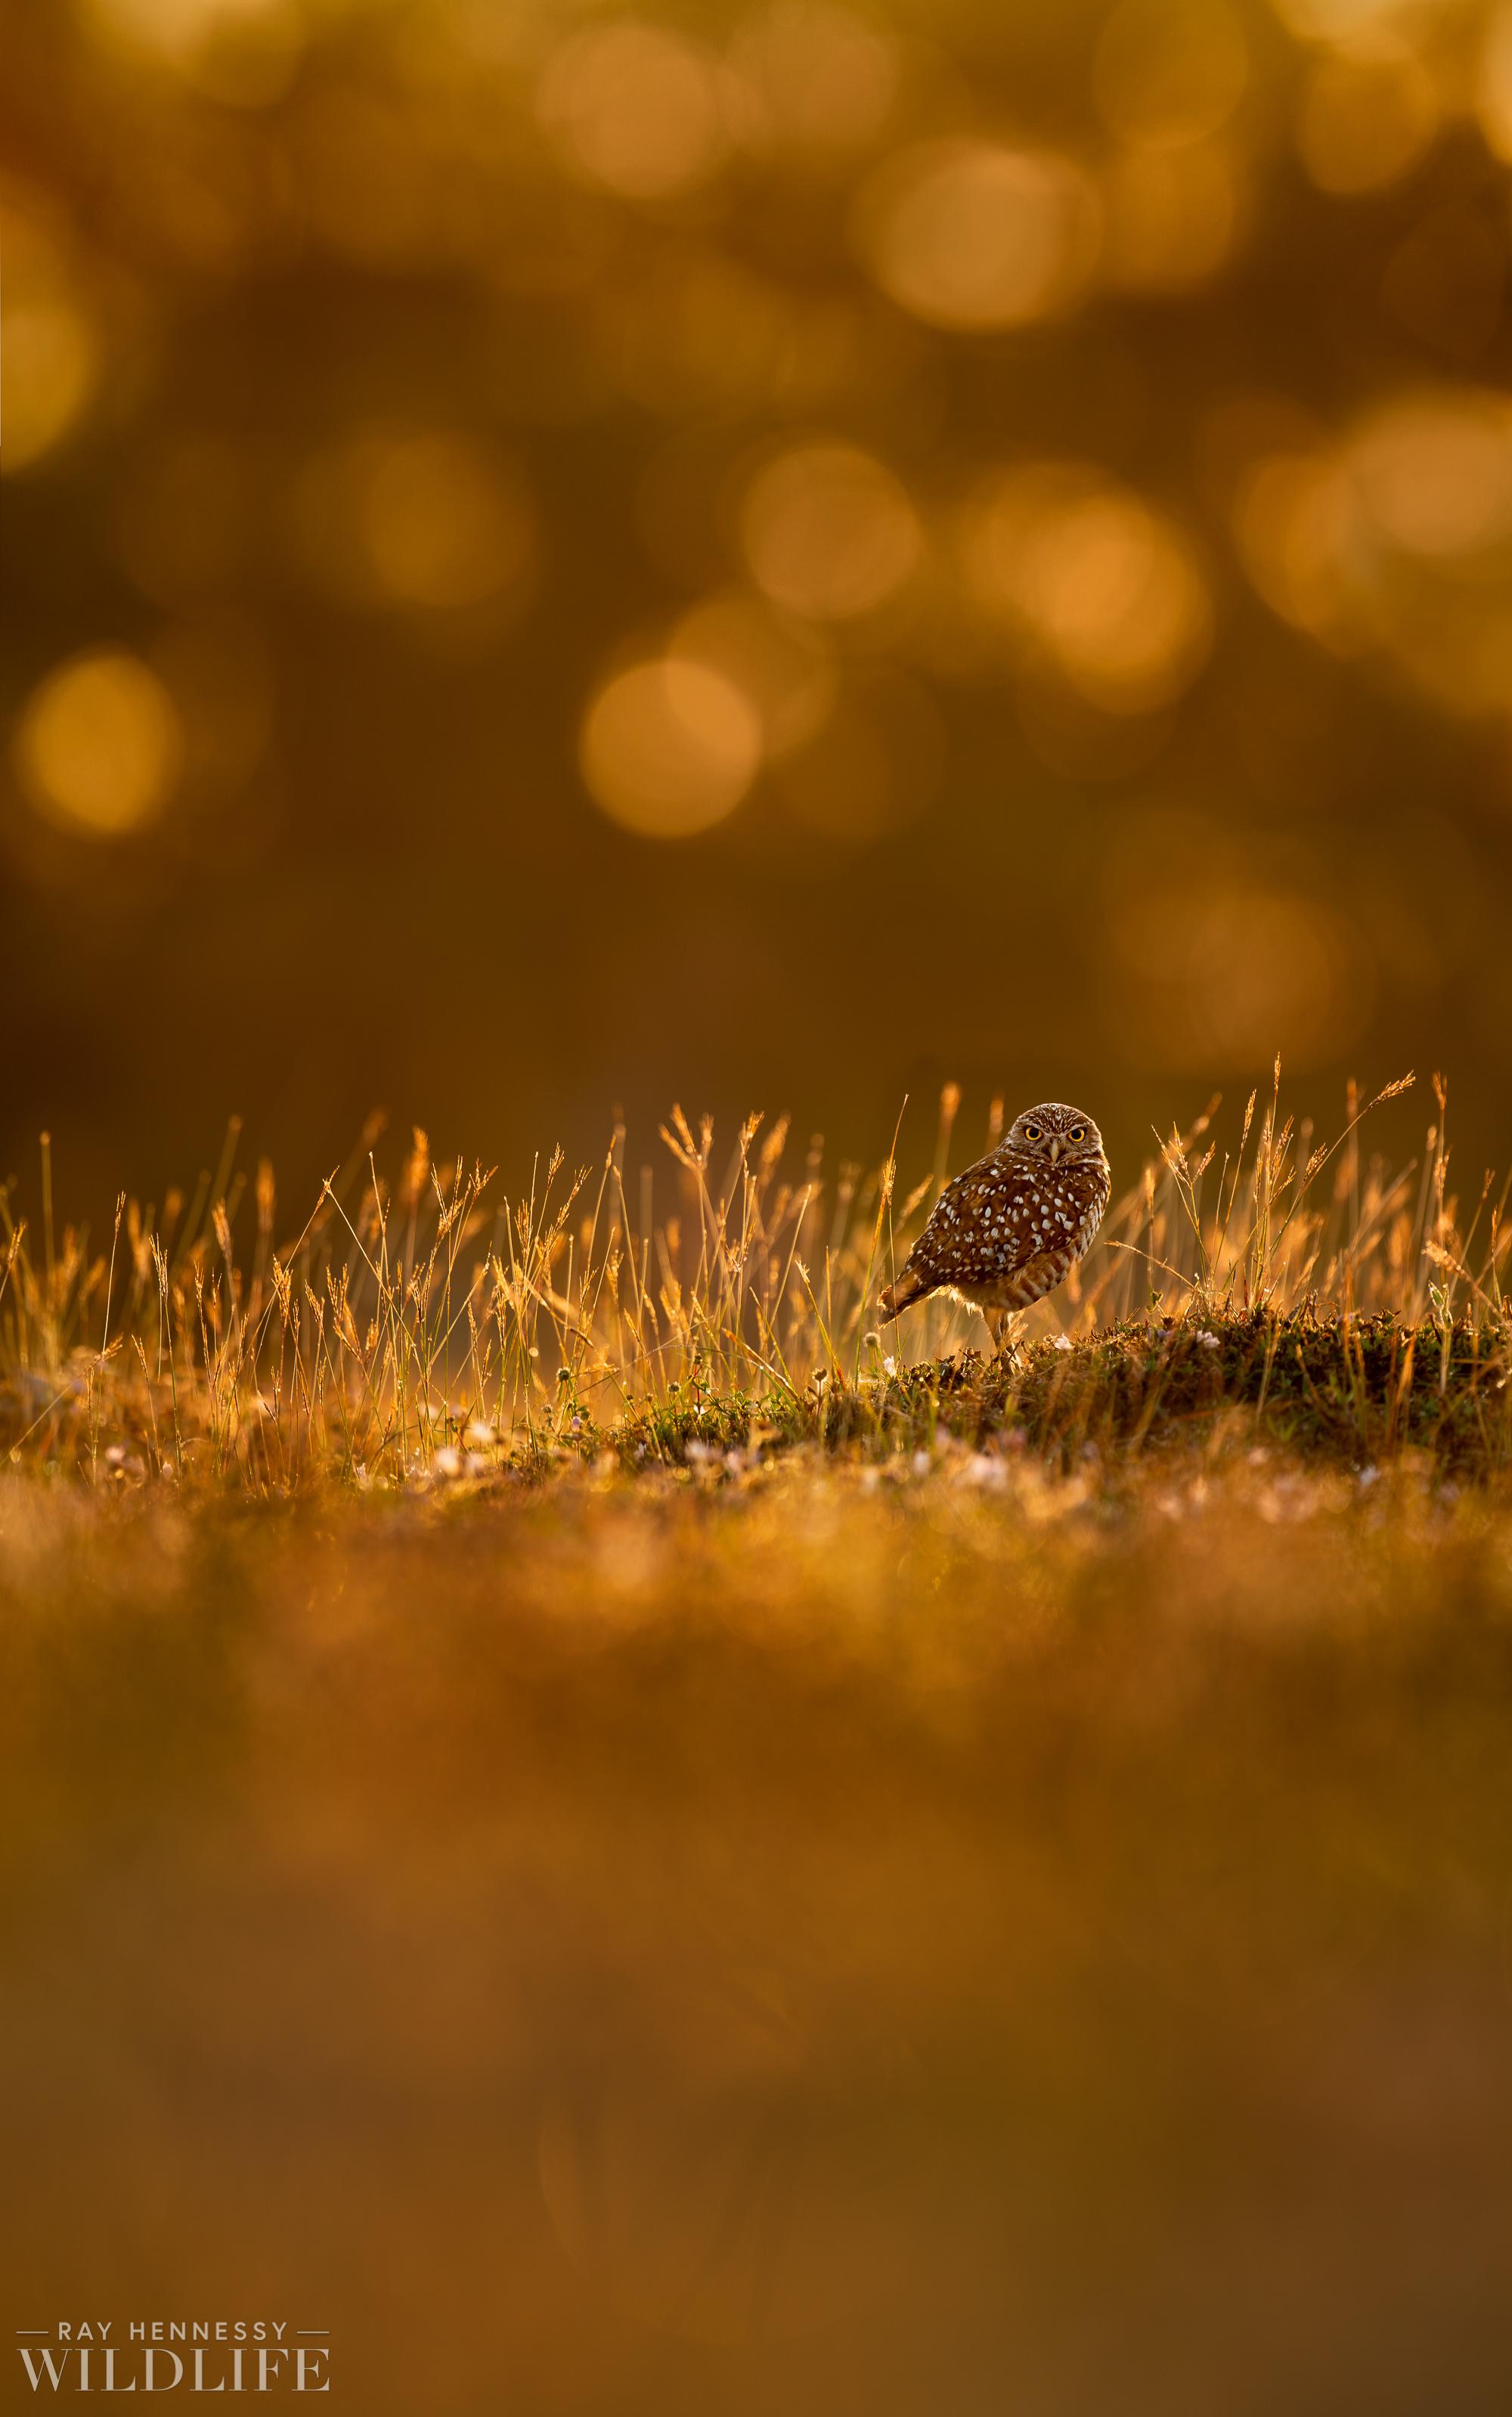 008_burrowing-owls-blue-heron-florida.jpg